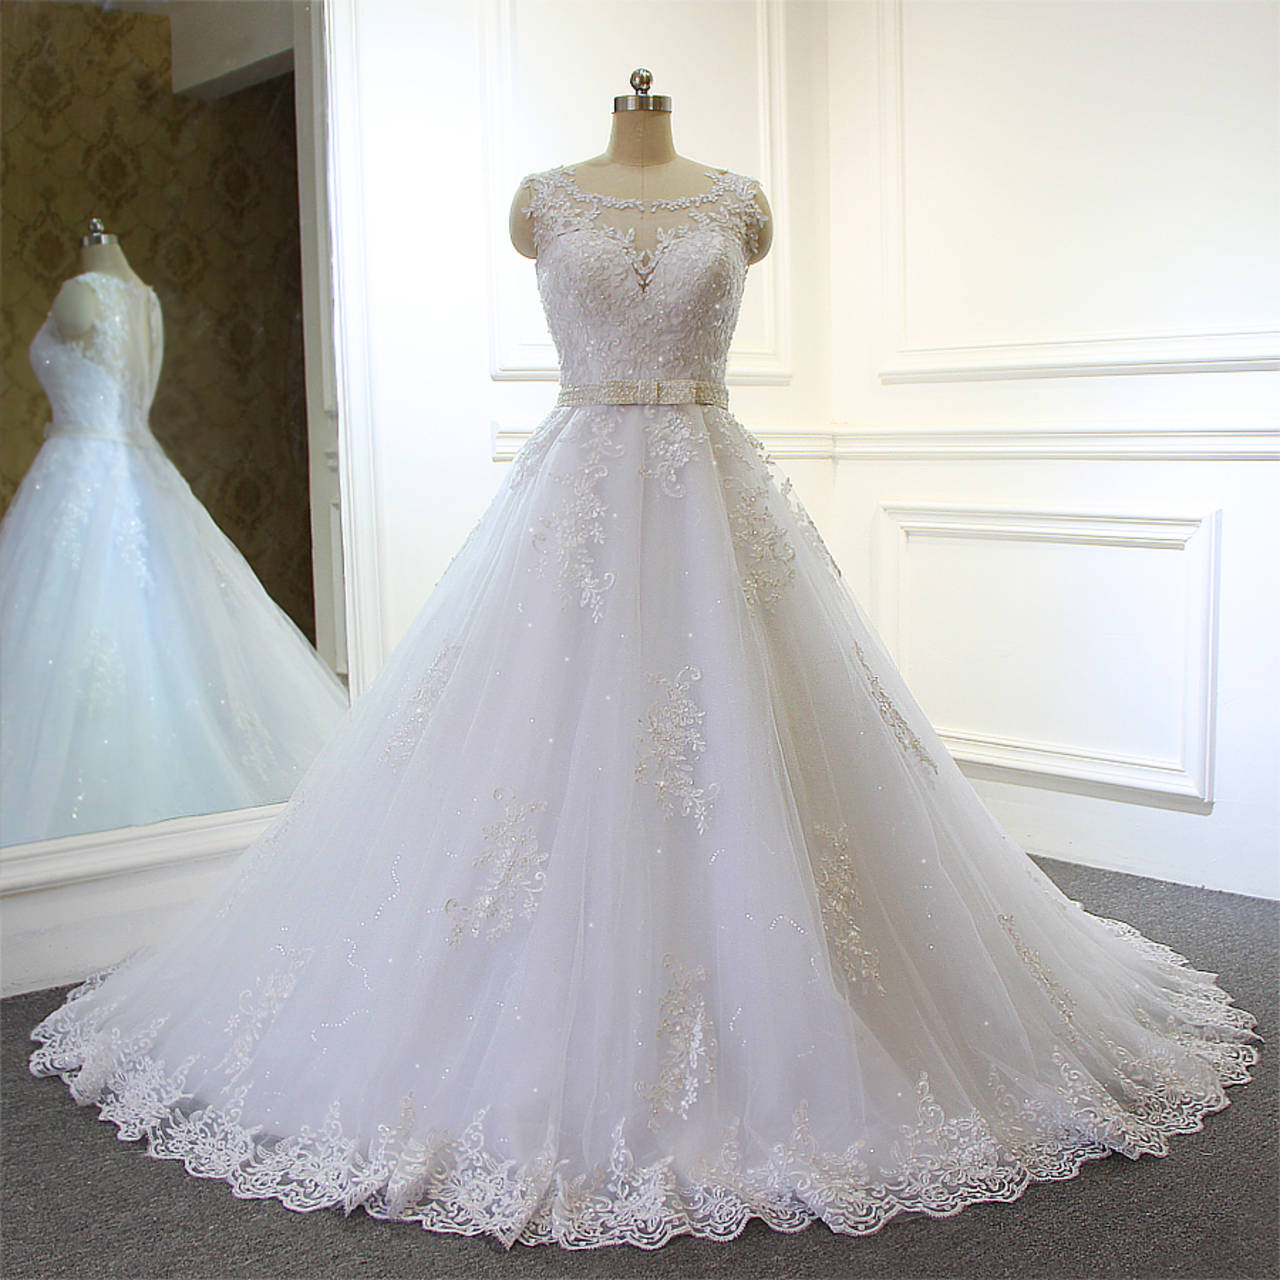 بالصور صور فساتين افراح , من اجمل فستان العروسه 1075 1